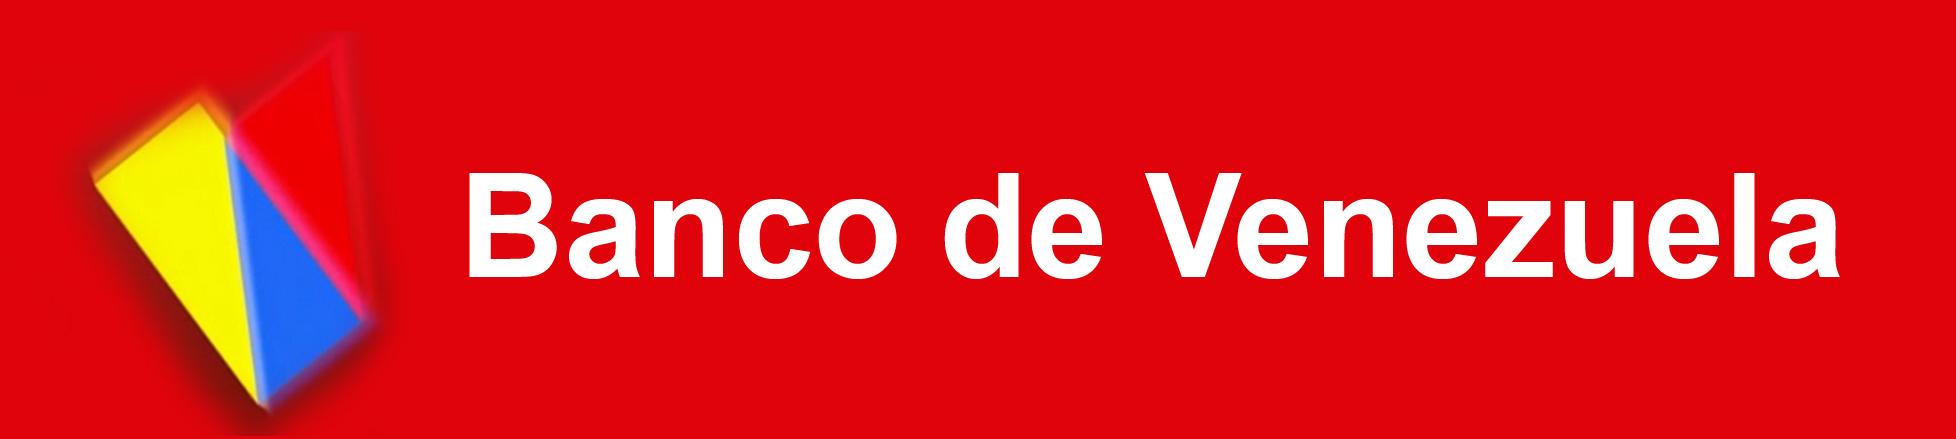 Ashampoo burning studio 9 03 serial inclusive for Banco exterior venezuela